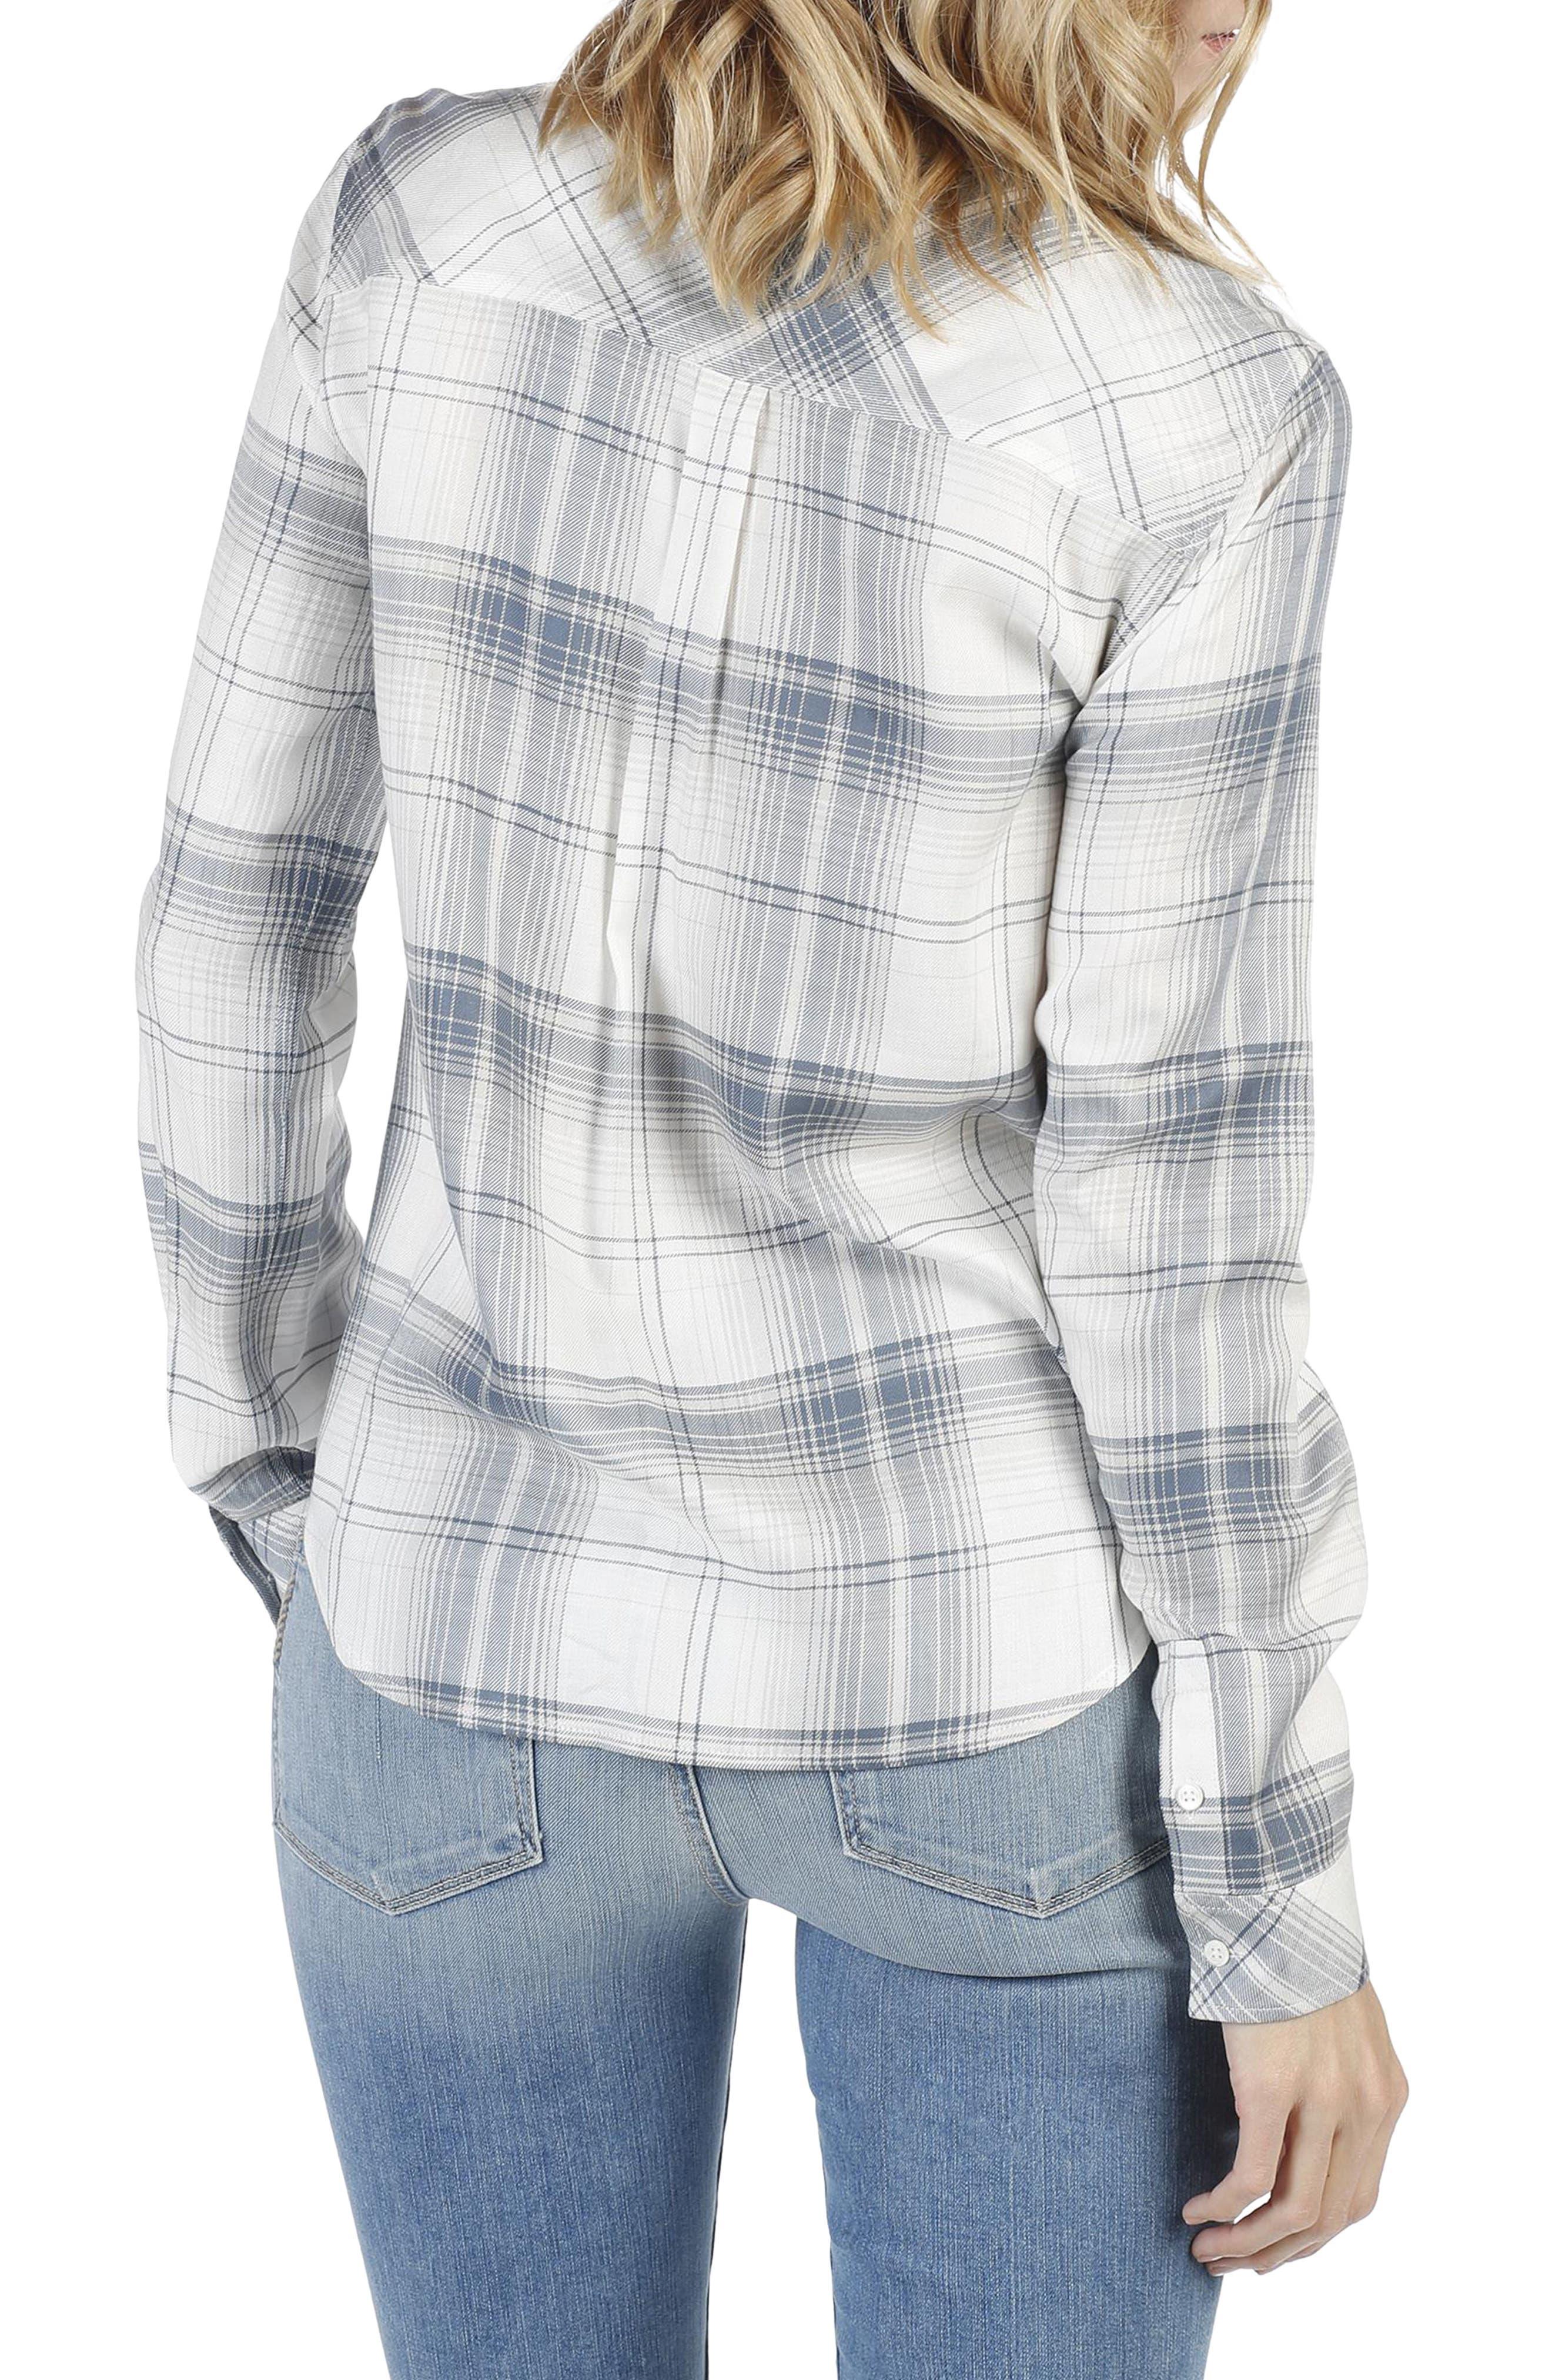 Bernette Plaid Shirt,                             Alternate thumbnail 3, color,                             001